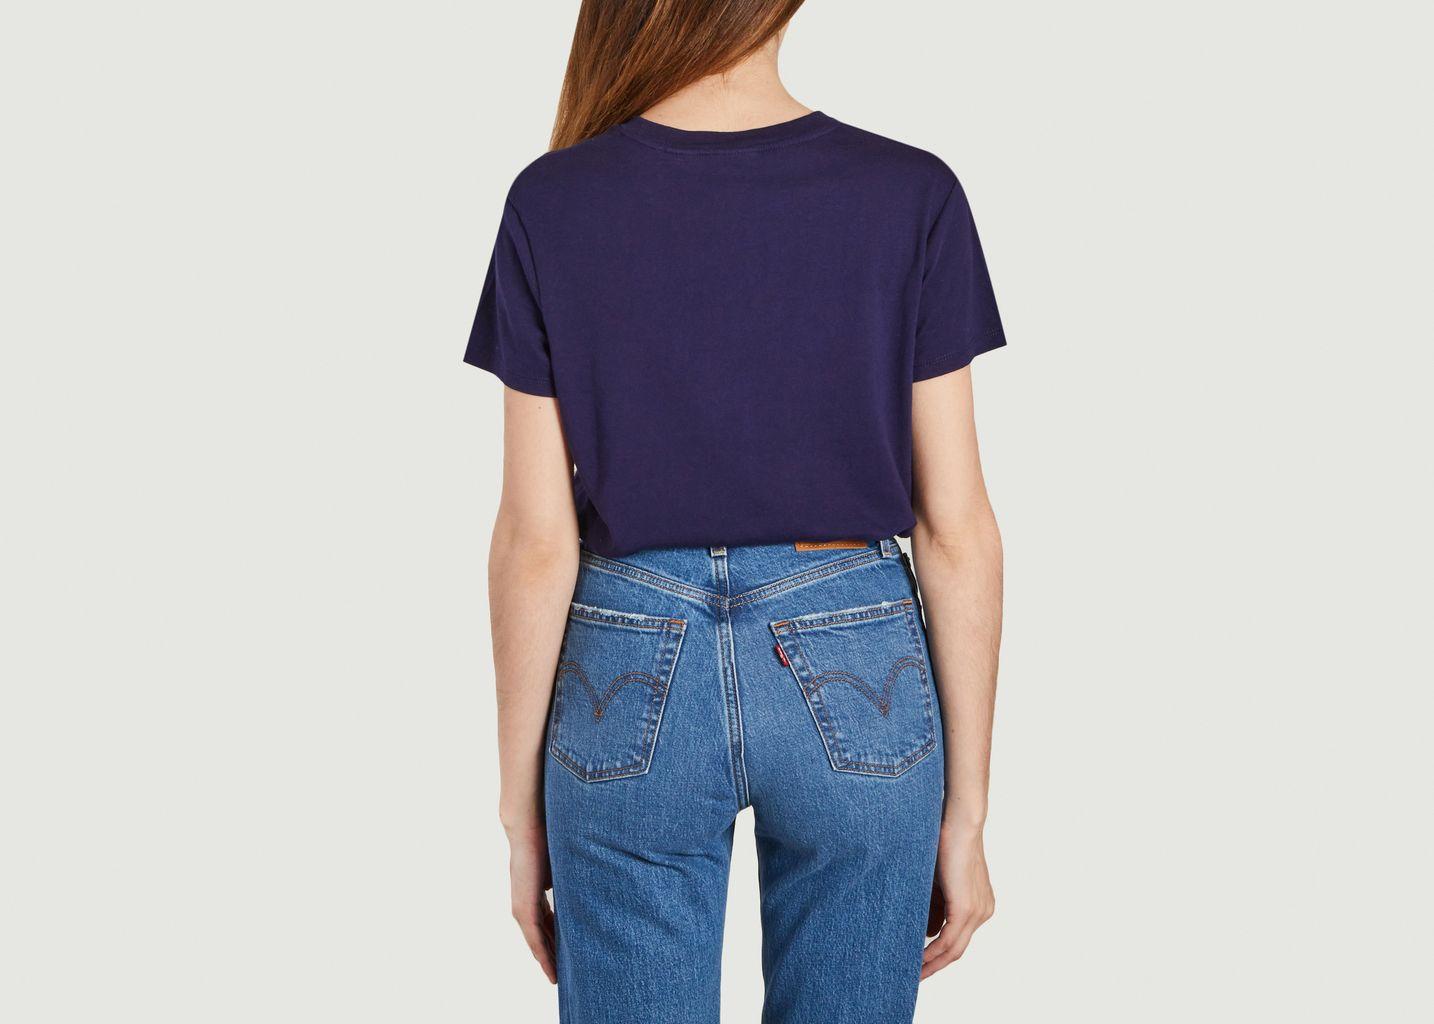 Le tee-shirt parfait  - Levi's Red Tab